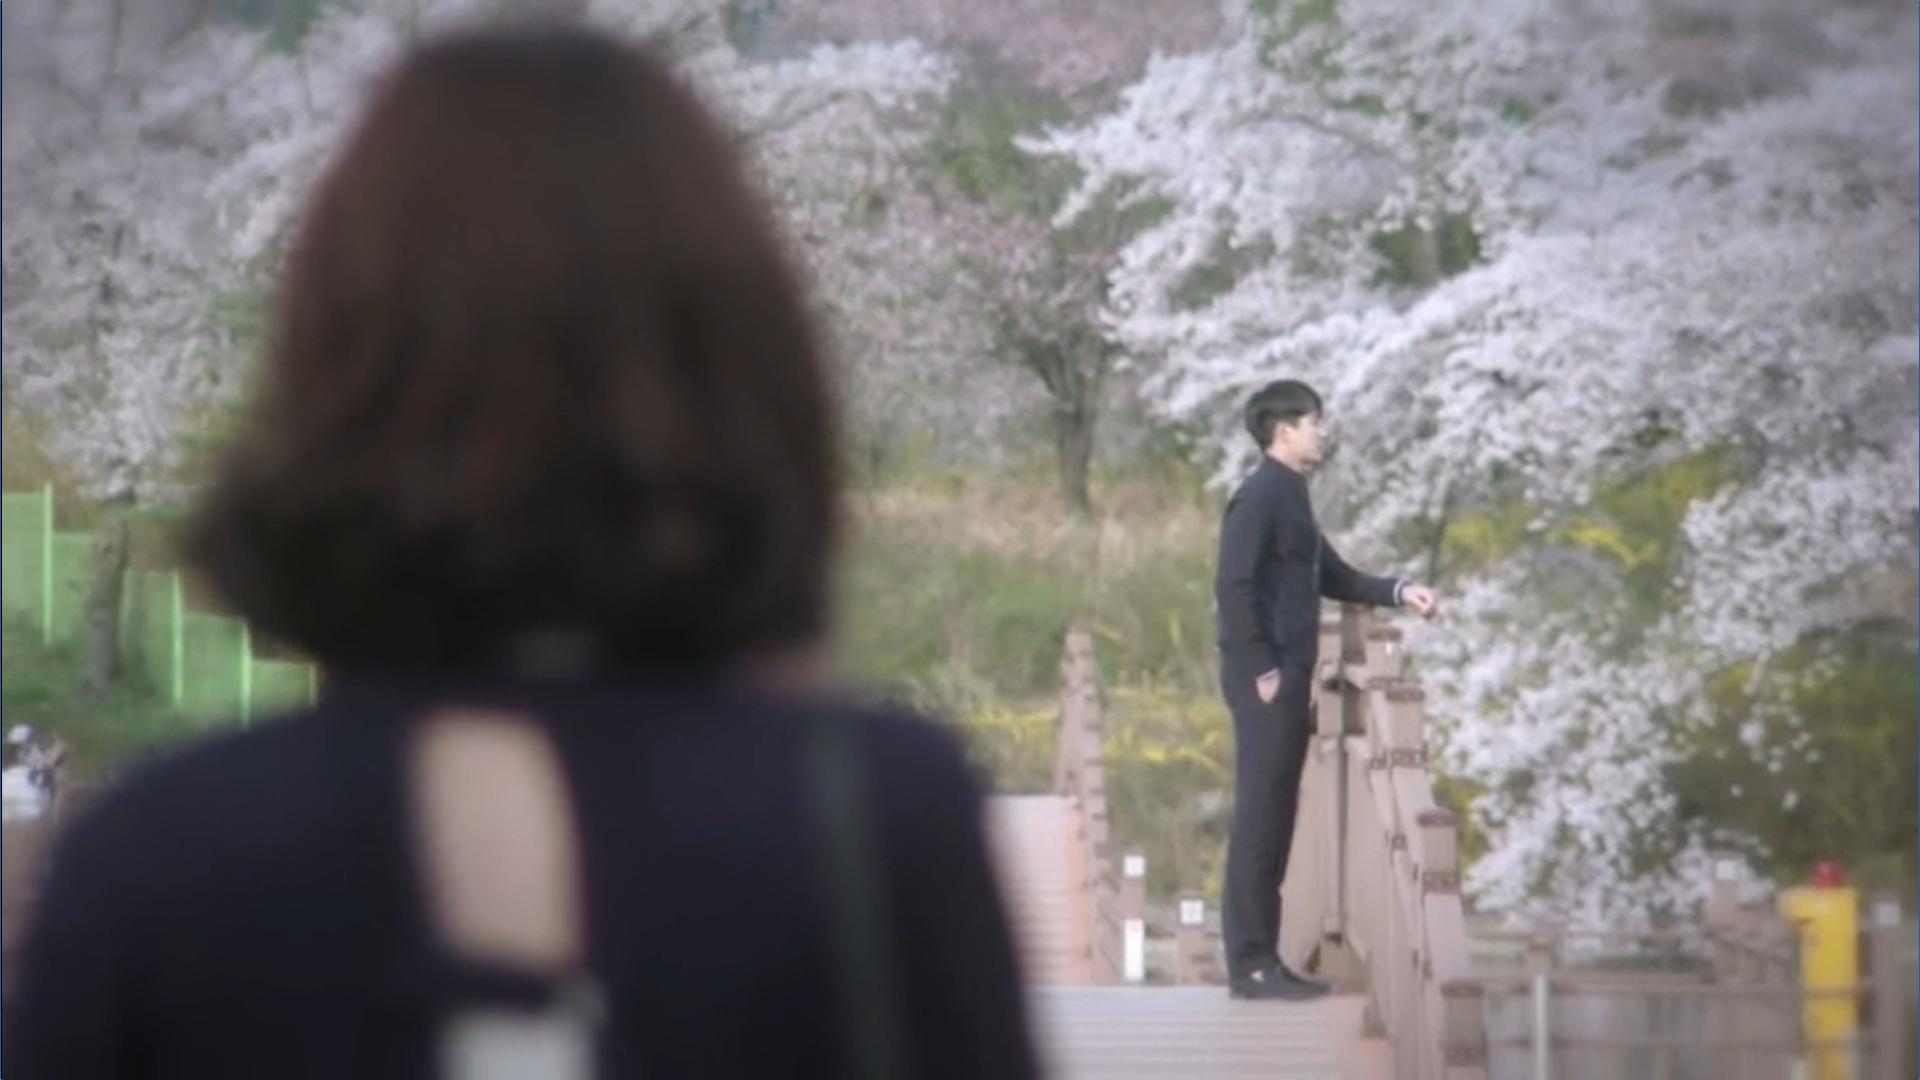 Wednesday 3:30 PM Seon Eun-woo seeing Baek Seung-gyu waiting for her